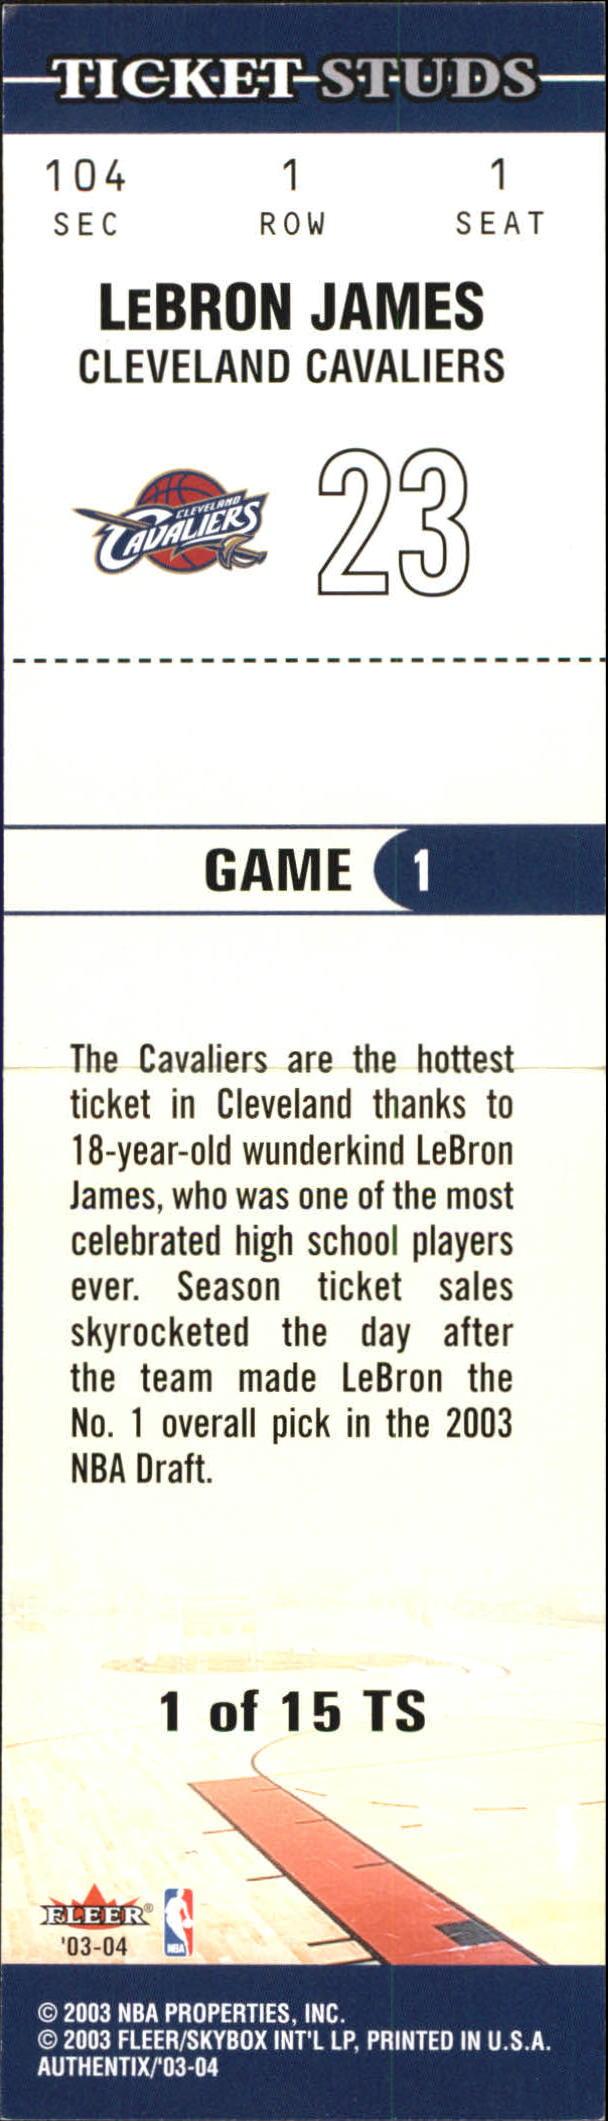 2003-04 Fleer Authentix Ticket Studs #1 LeBron James back image